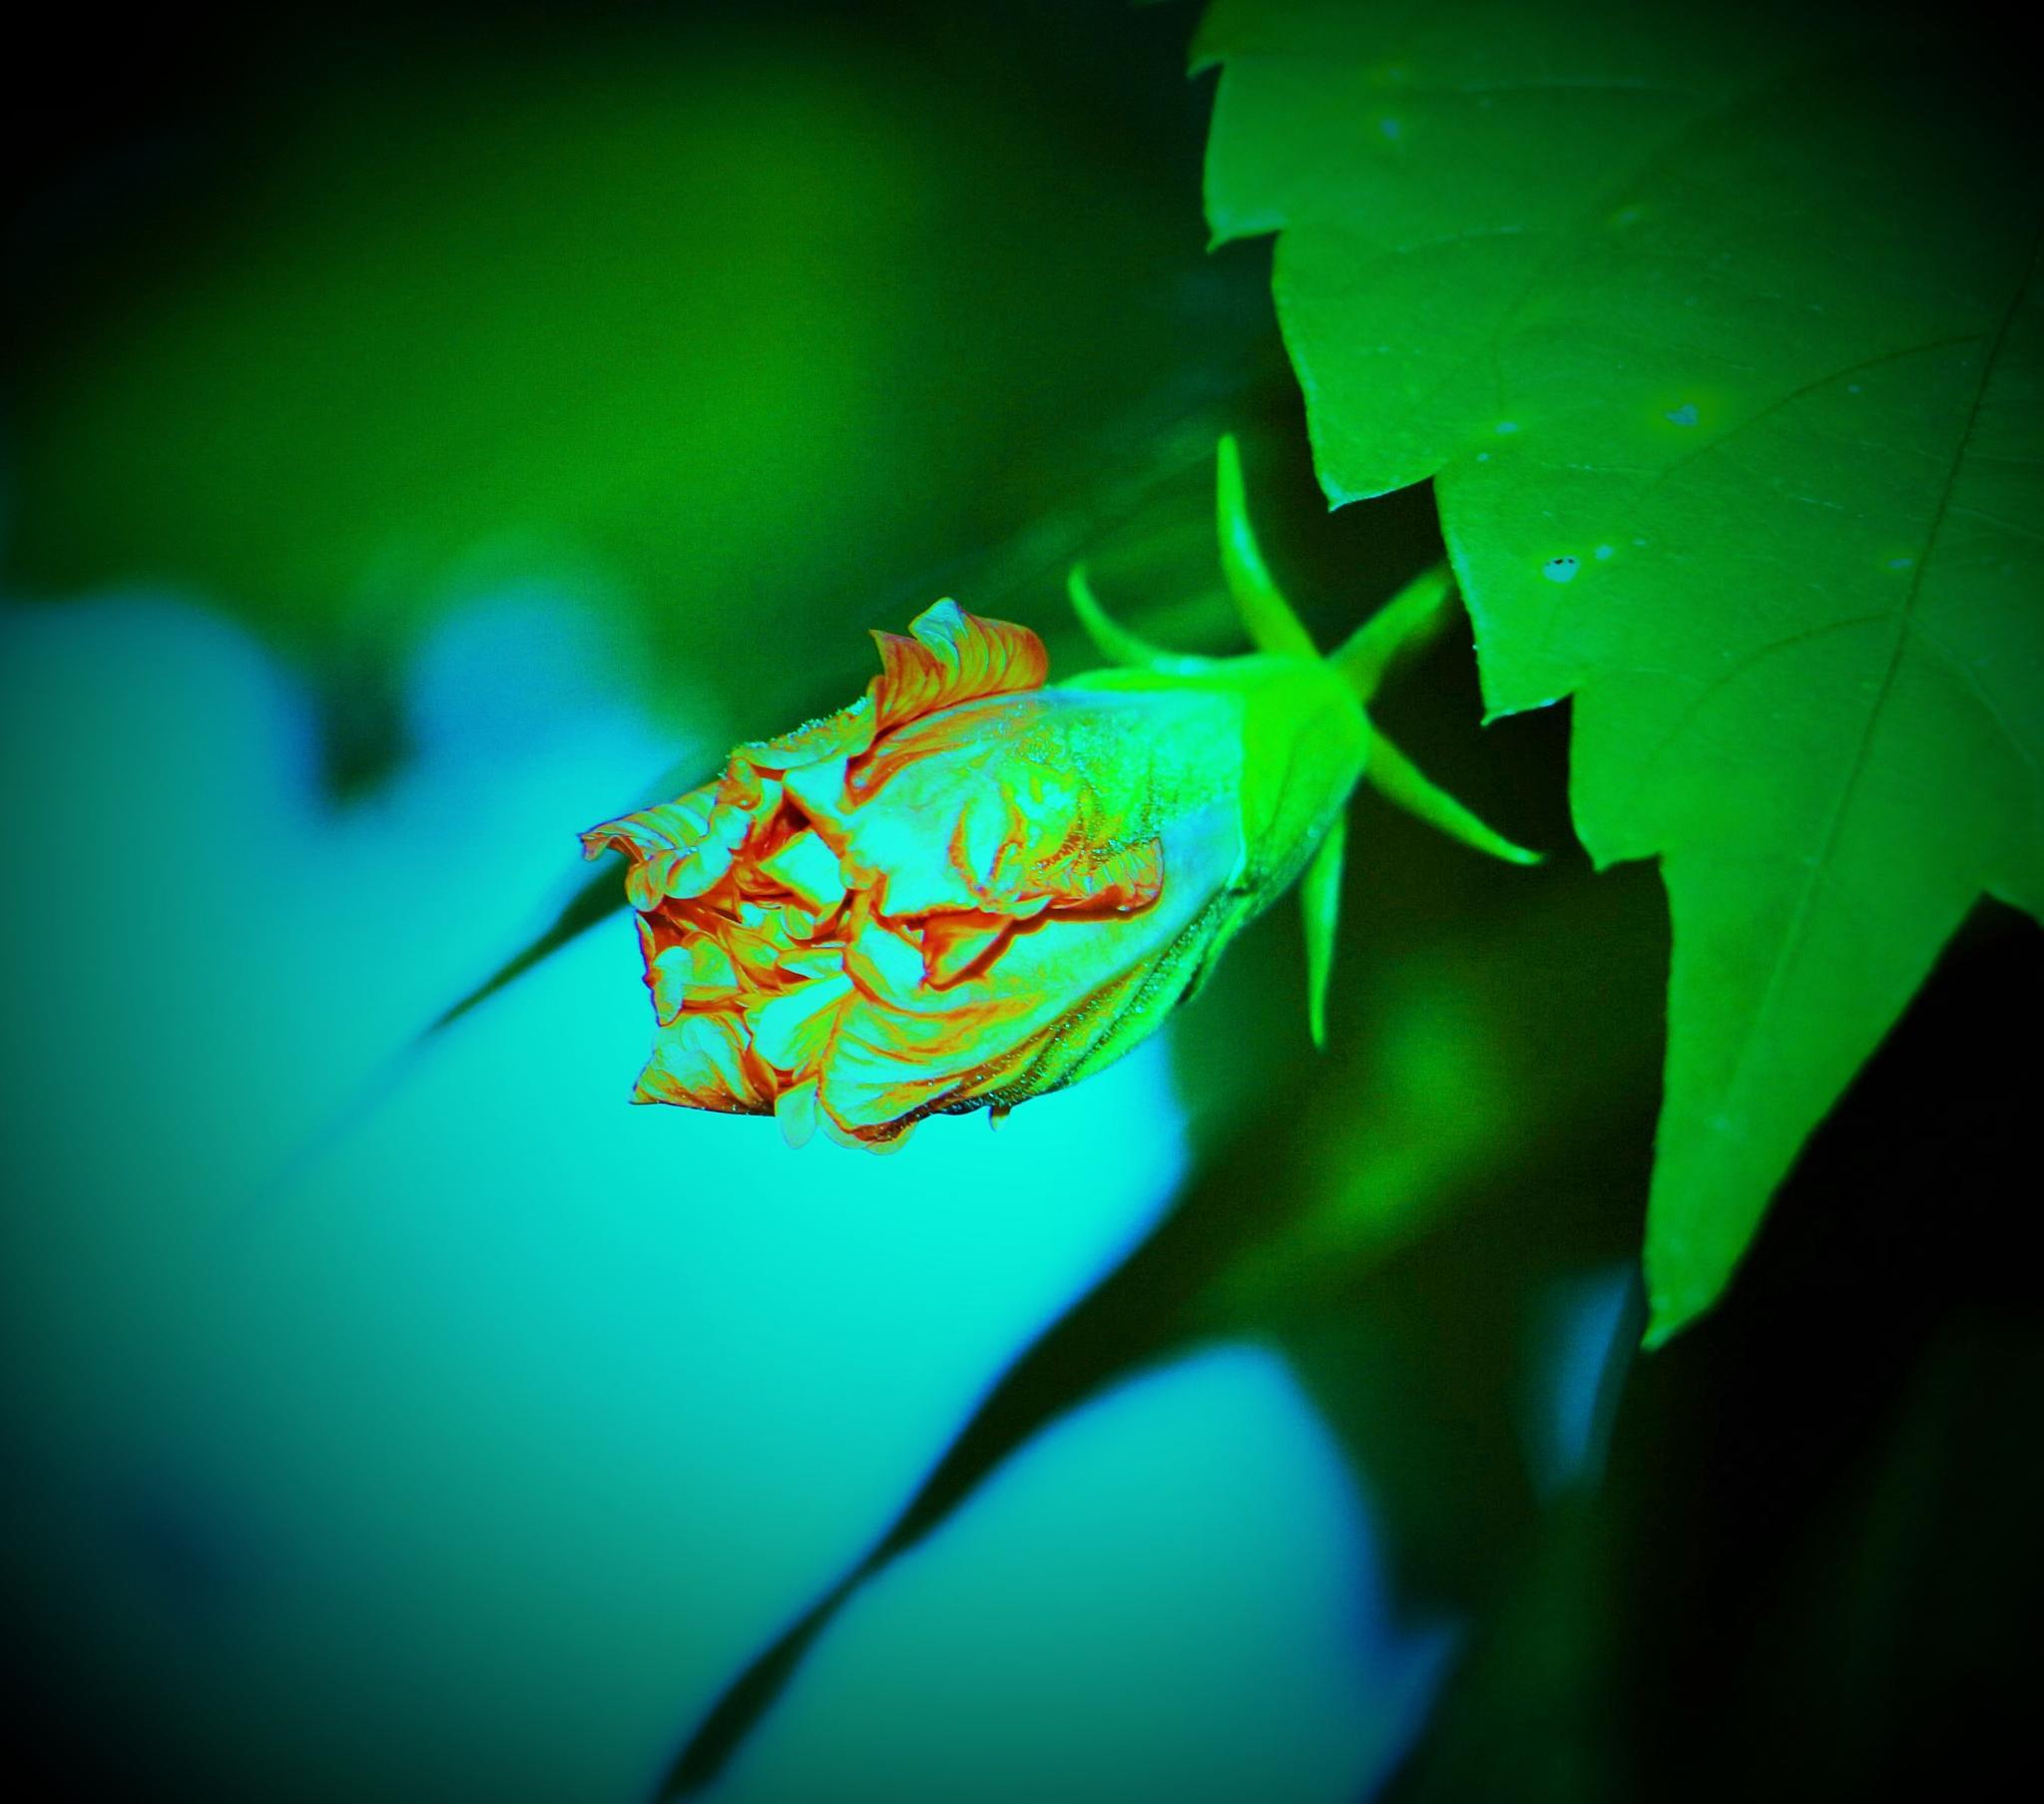 Flower Bud. by A.Samathasena